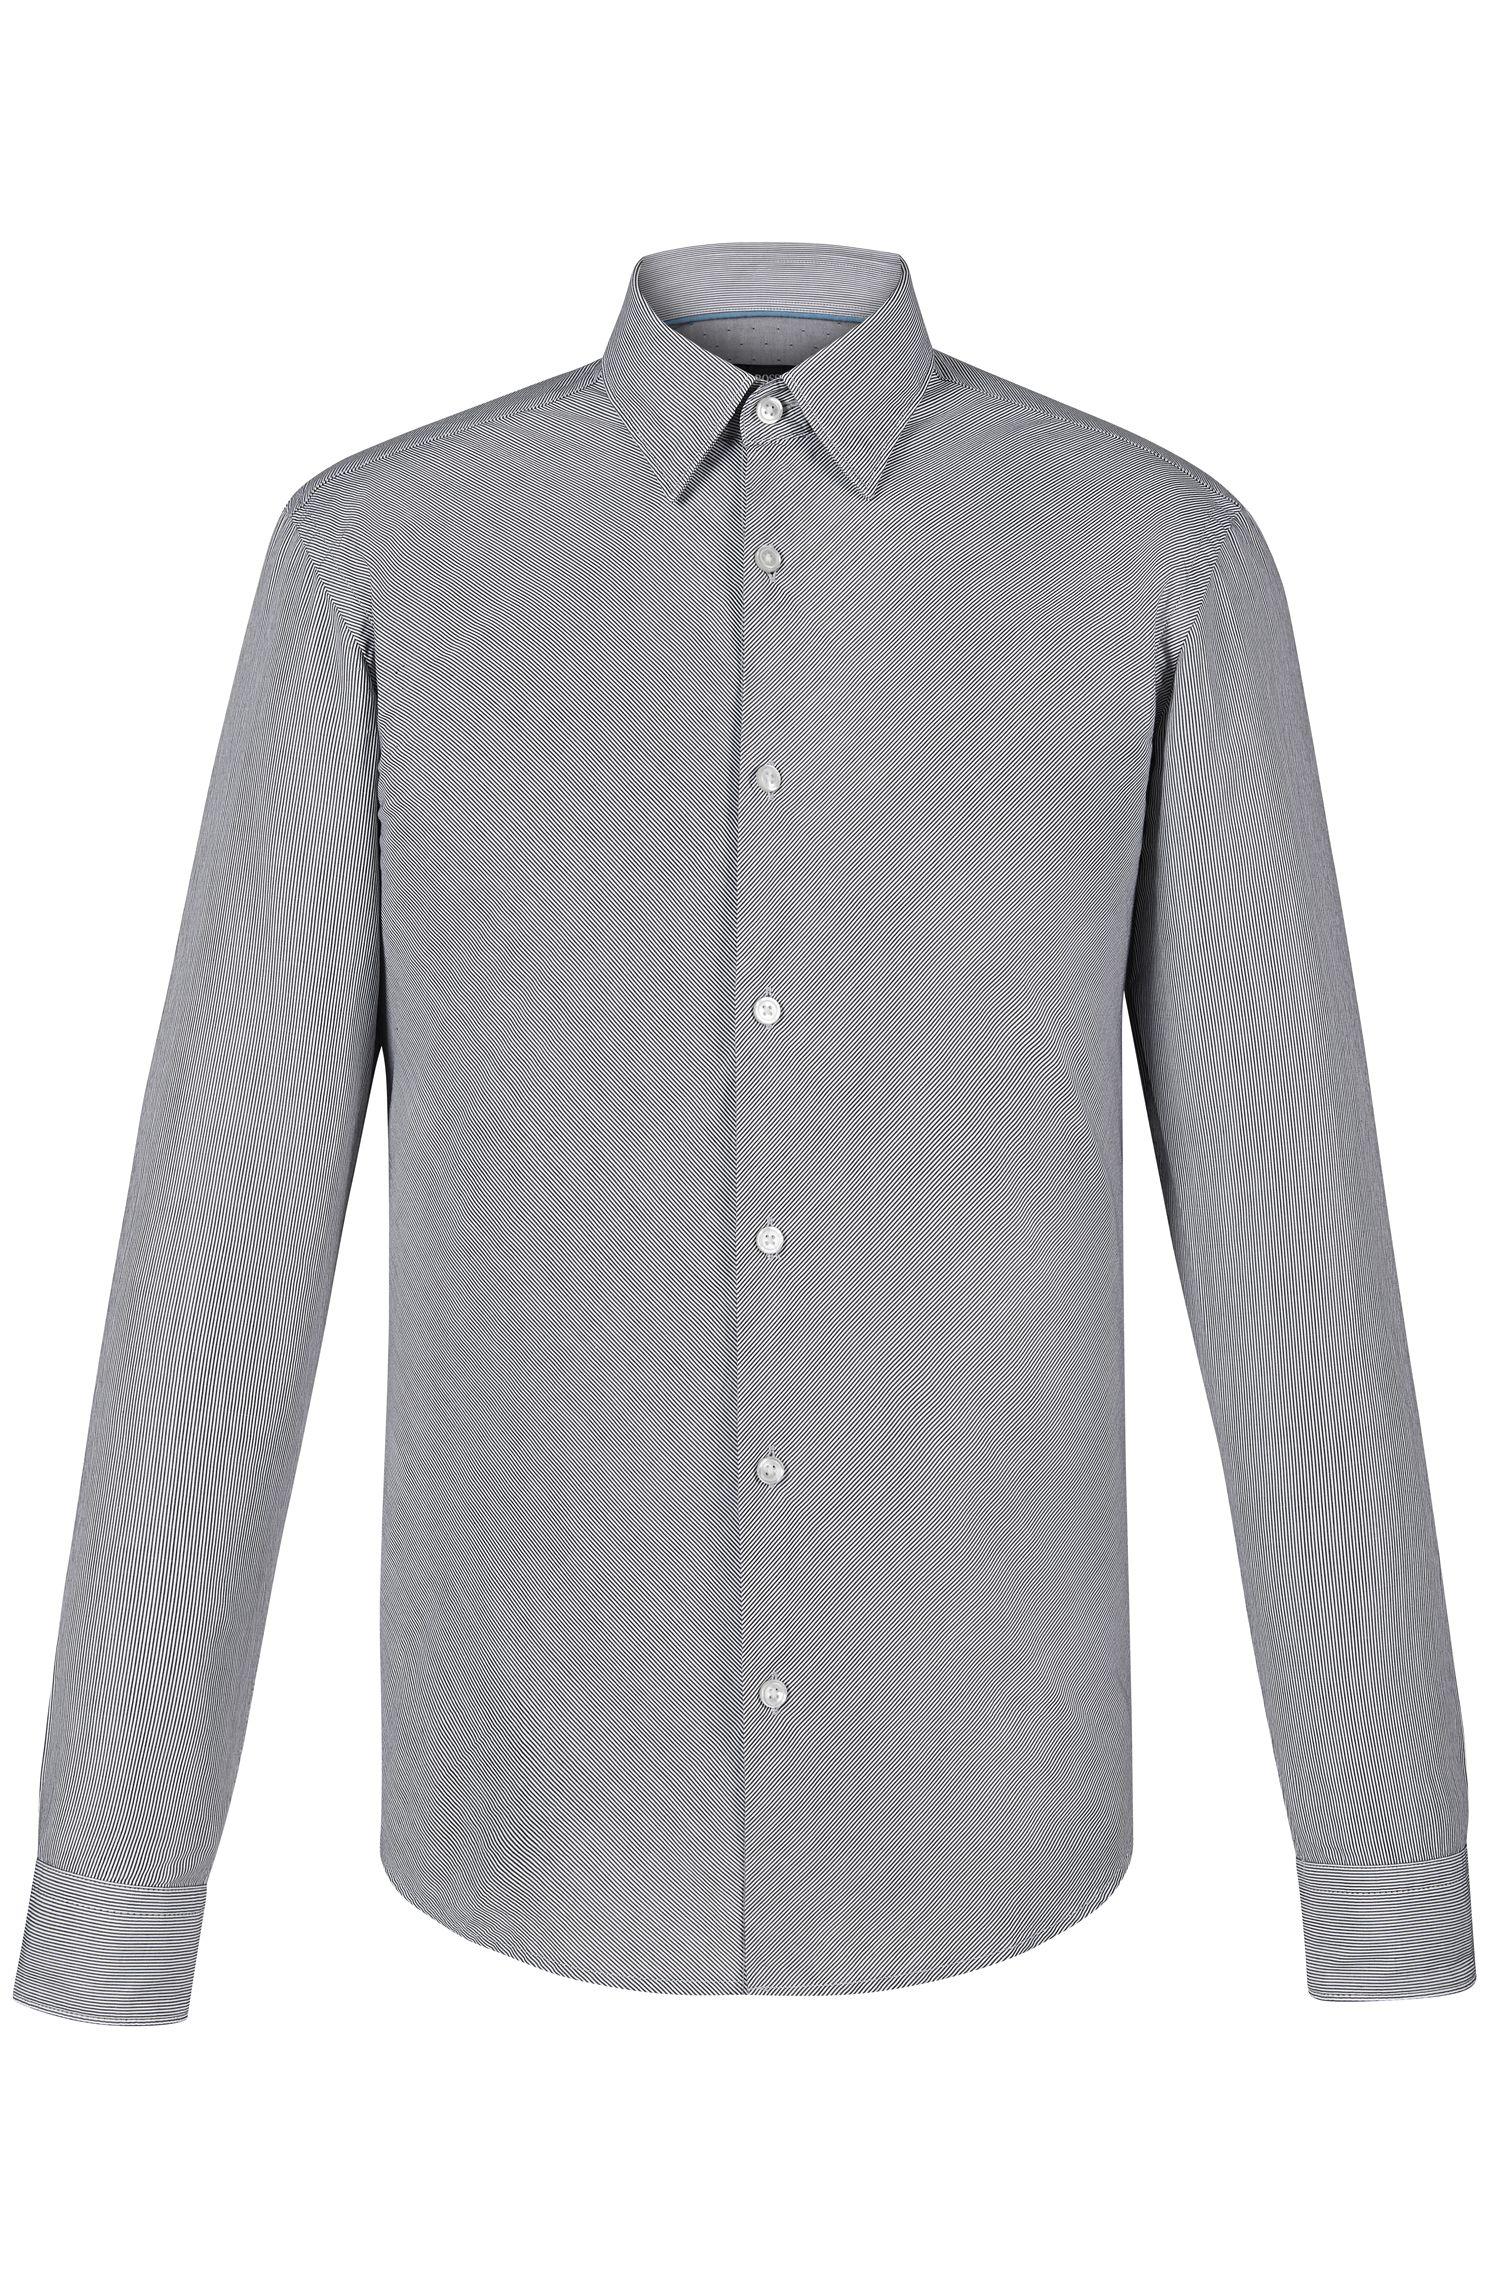 Striped Cotton Button Down Shirt, Slim Fit | Rodney